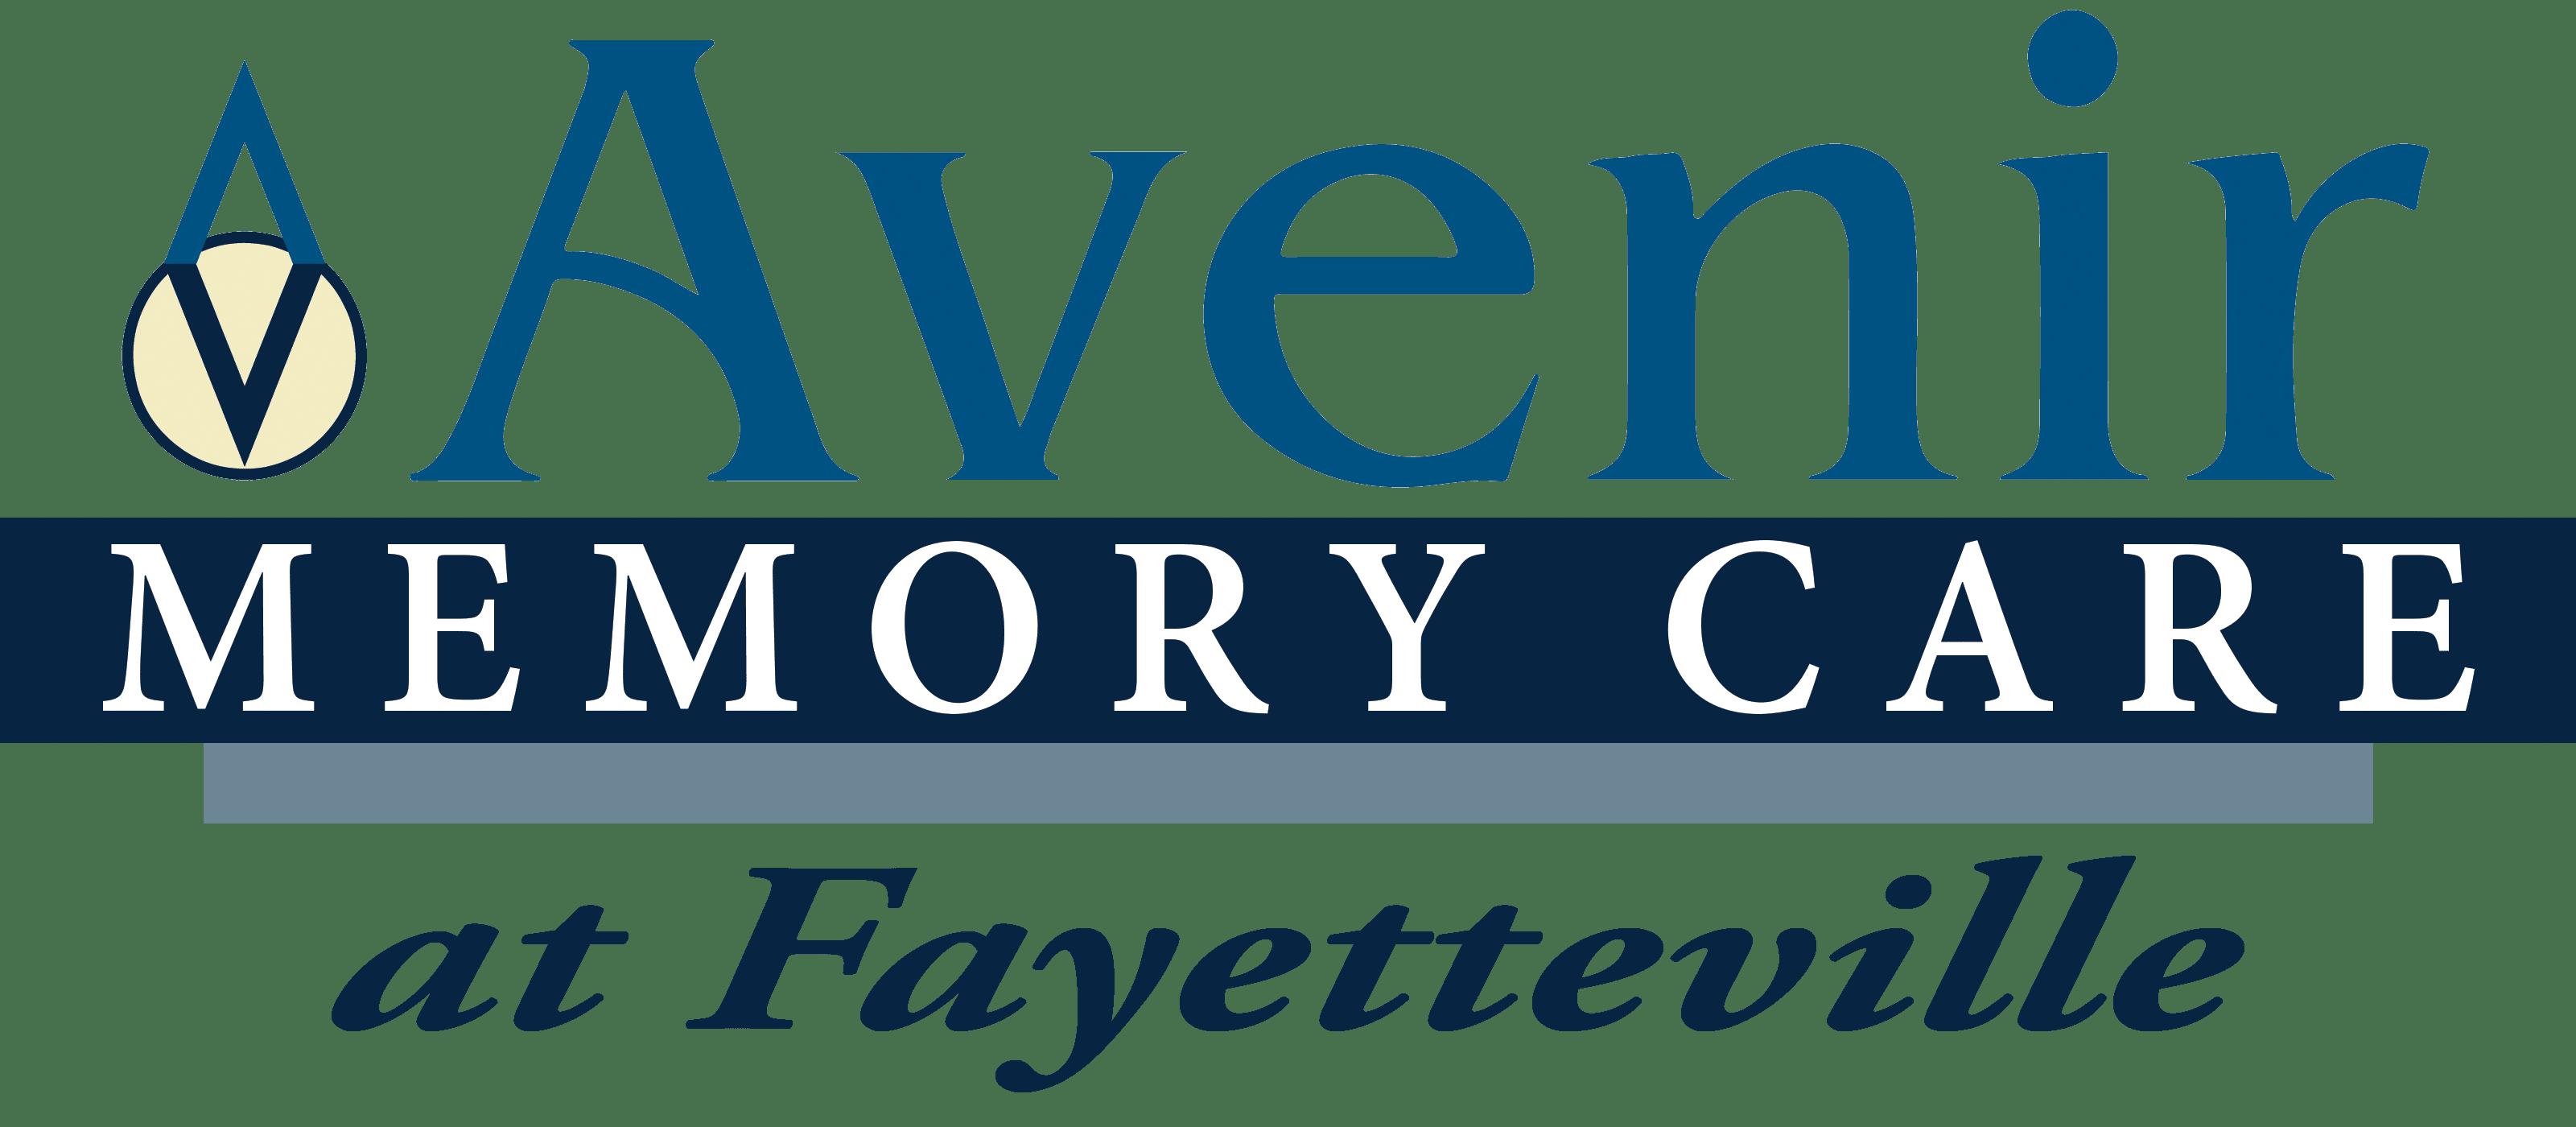 Avenir Memory Care at Fayetteville